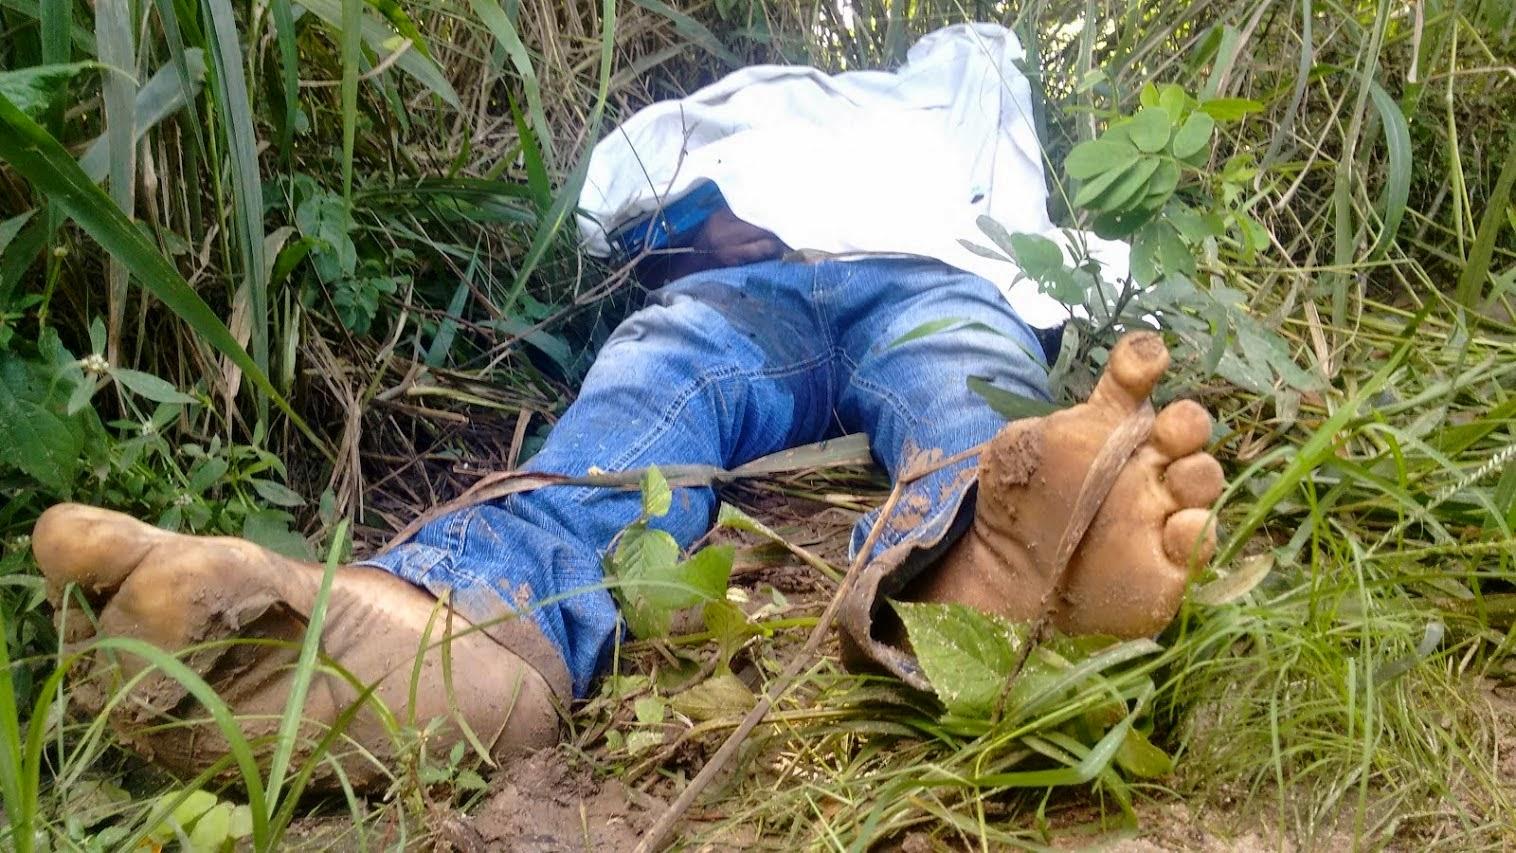 Radialista Djalma Santos da Concei§£o é sequestrado e executado